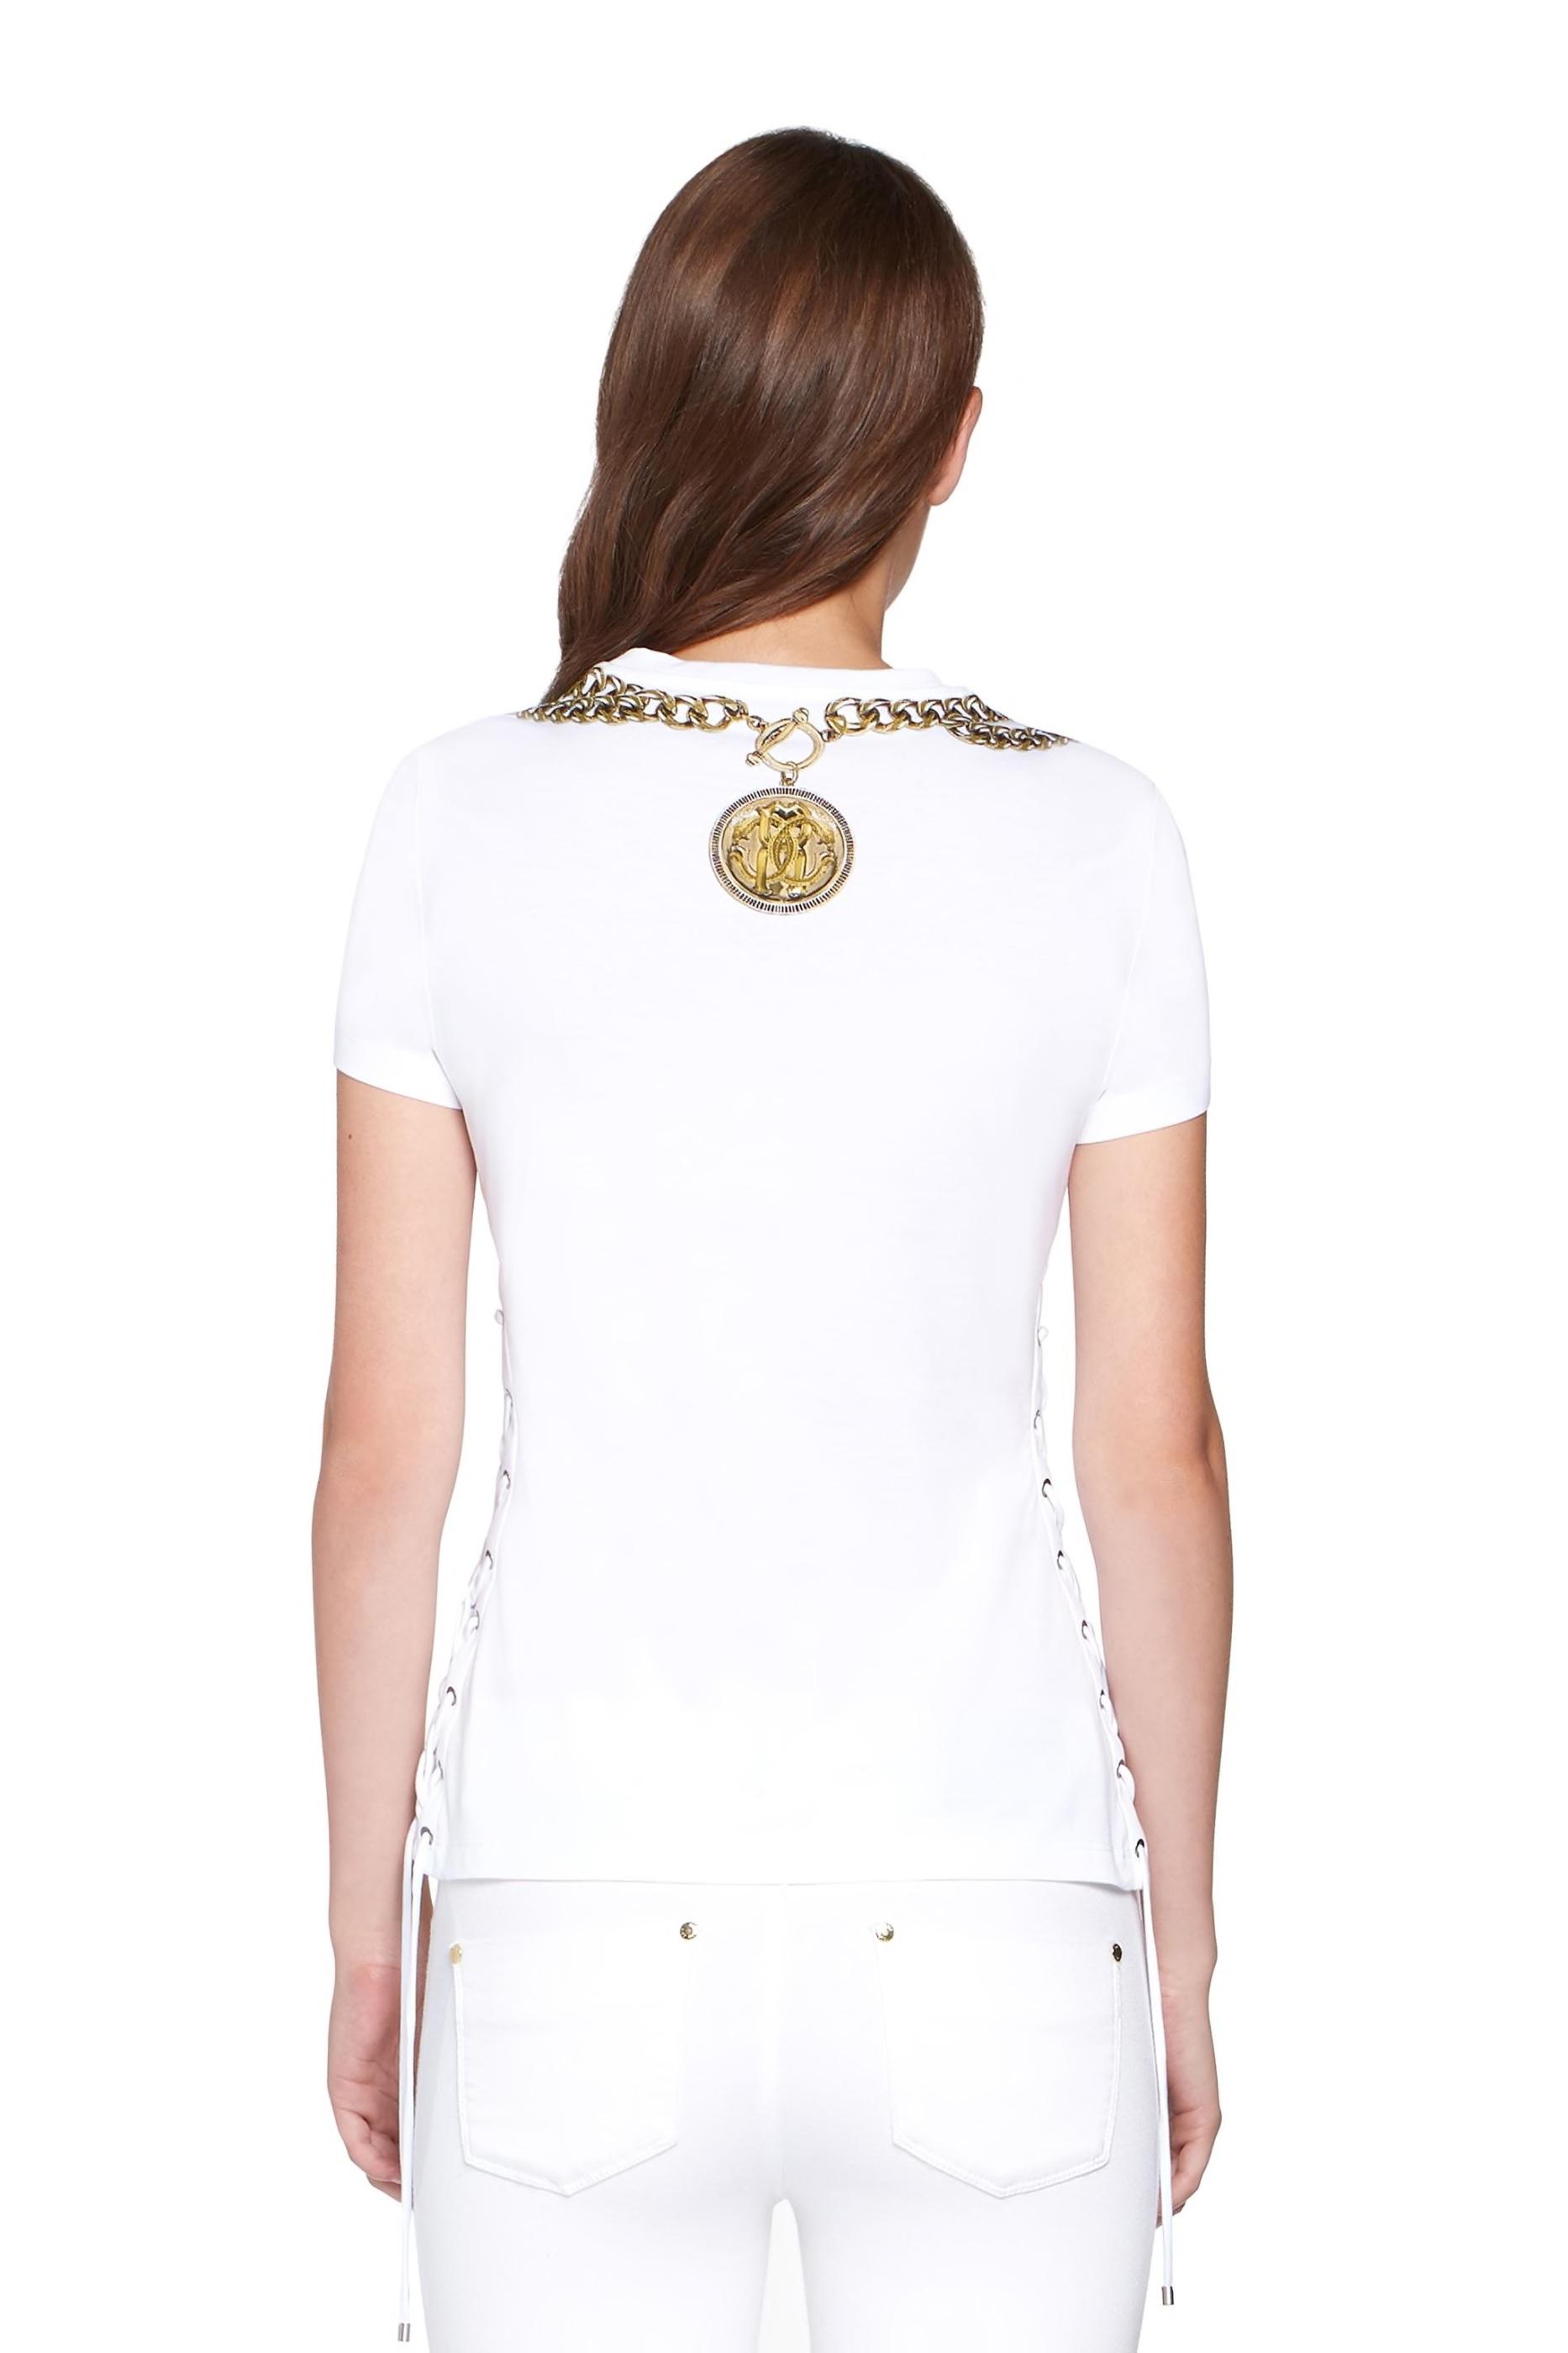 roberto-cavalli-medallion-print-t-shirt_13150805_15612855_2048.jpg